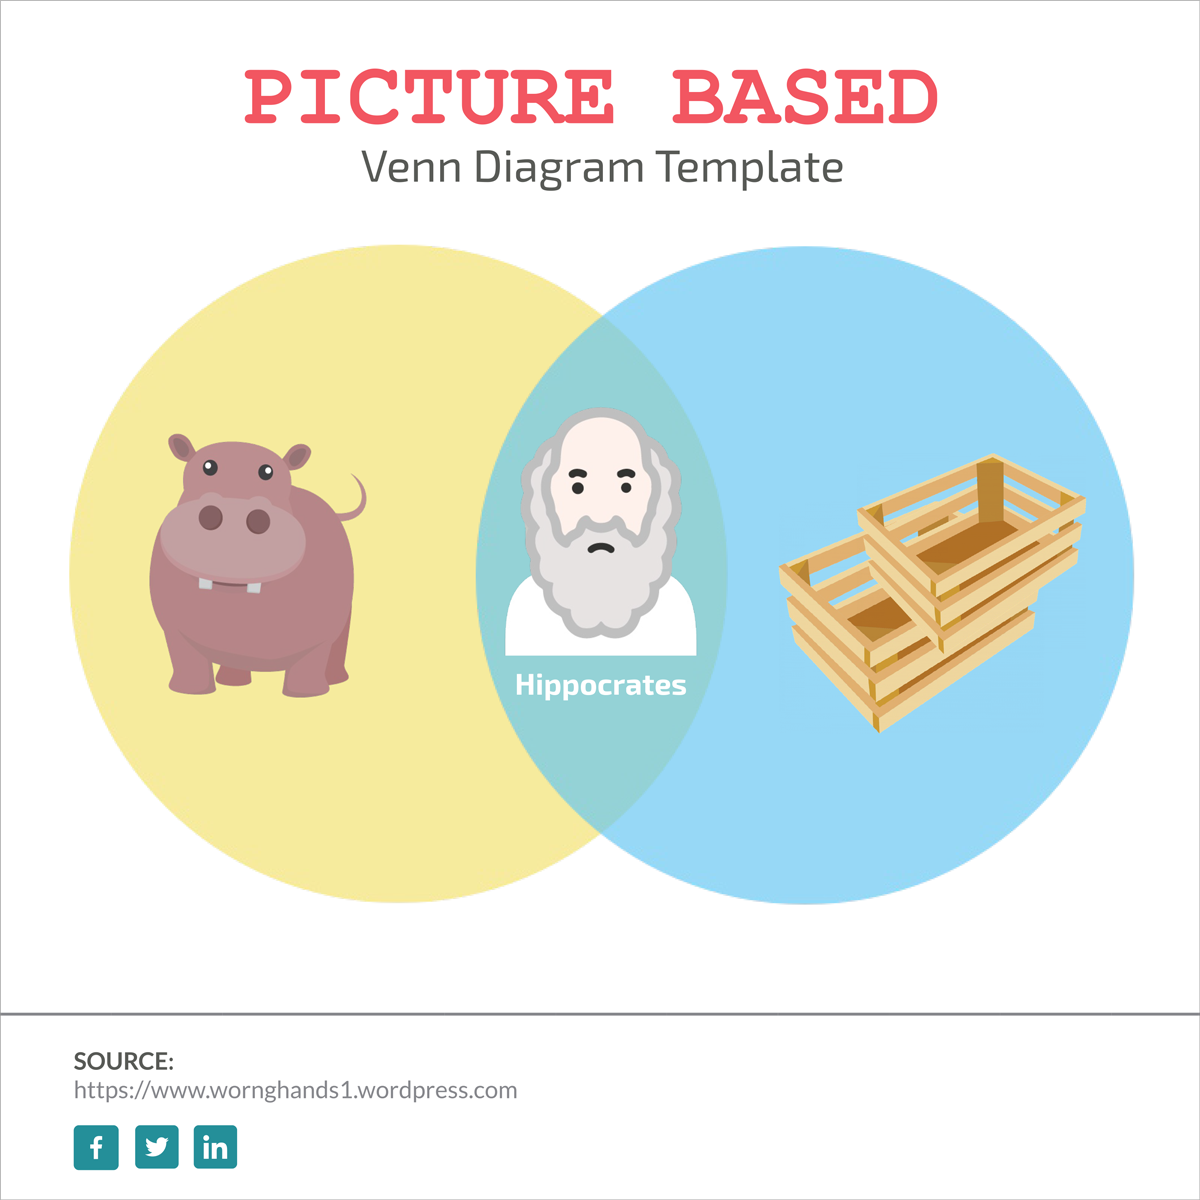 Picture-Based venn diagram template